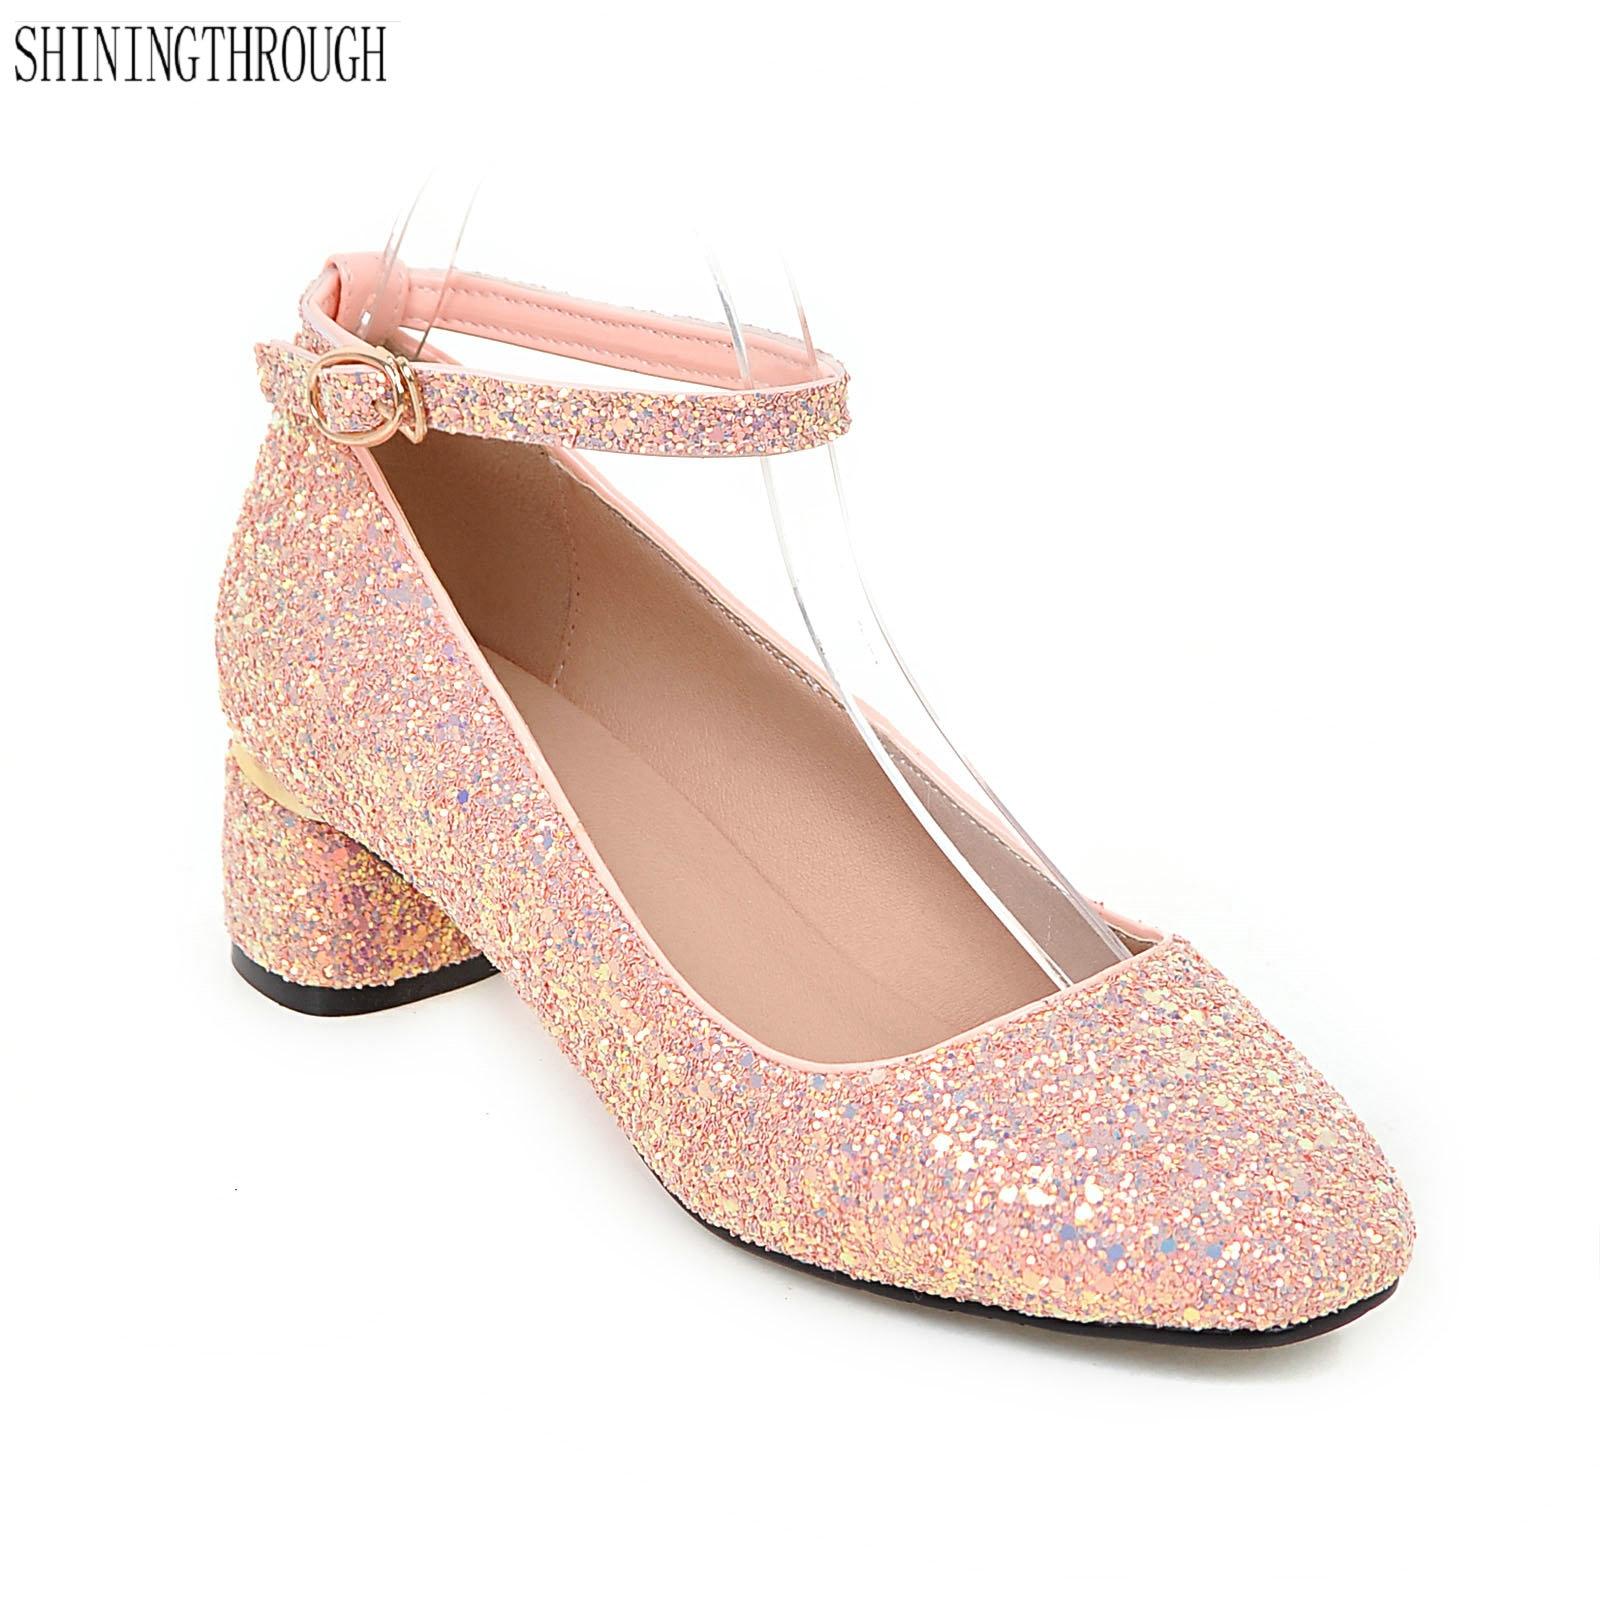 New fashion 2018 square toe pumps women silver stilettos heels shoes ankle buckle low heel pumps gold wedding shoes women цена 2017